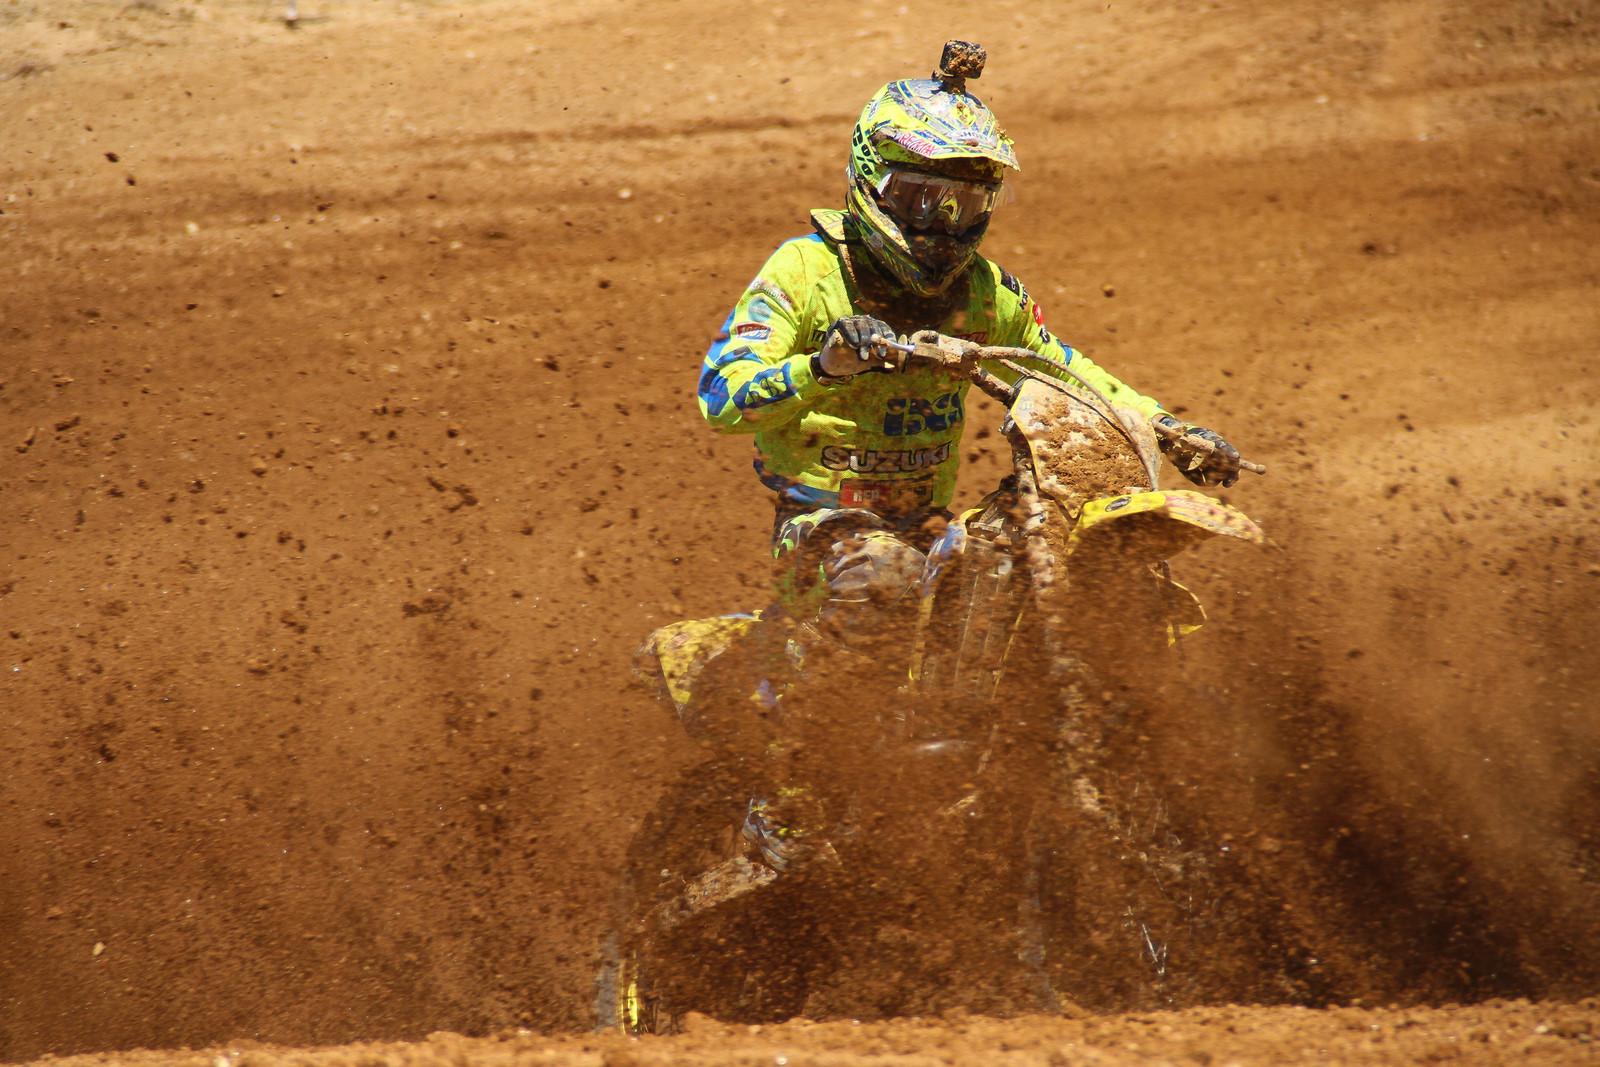 Jeremy Seewer - ayearinmx - Motocross Pictures - Vital MX